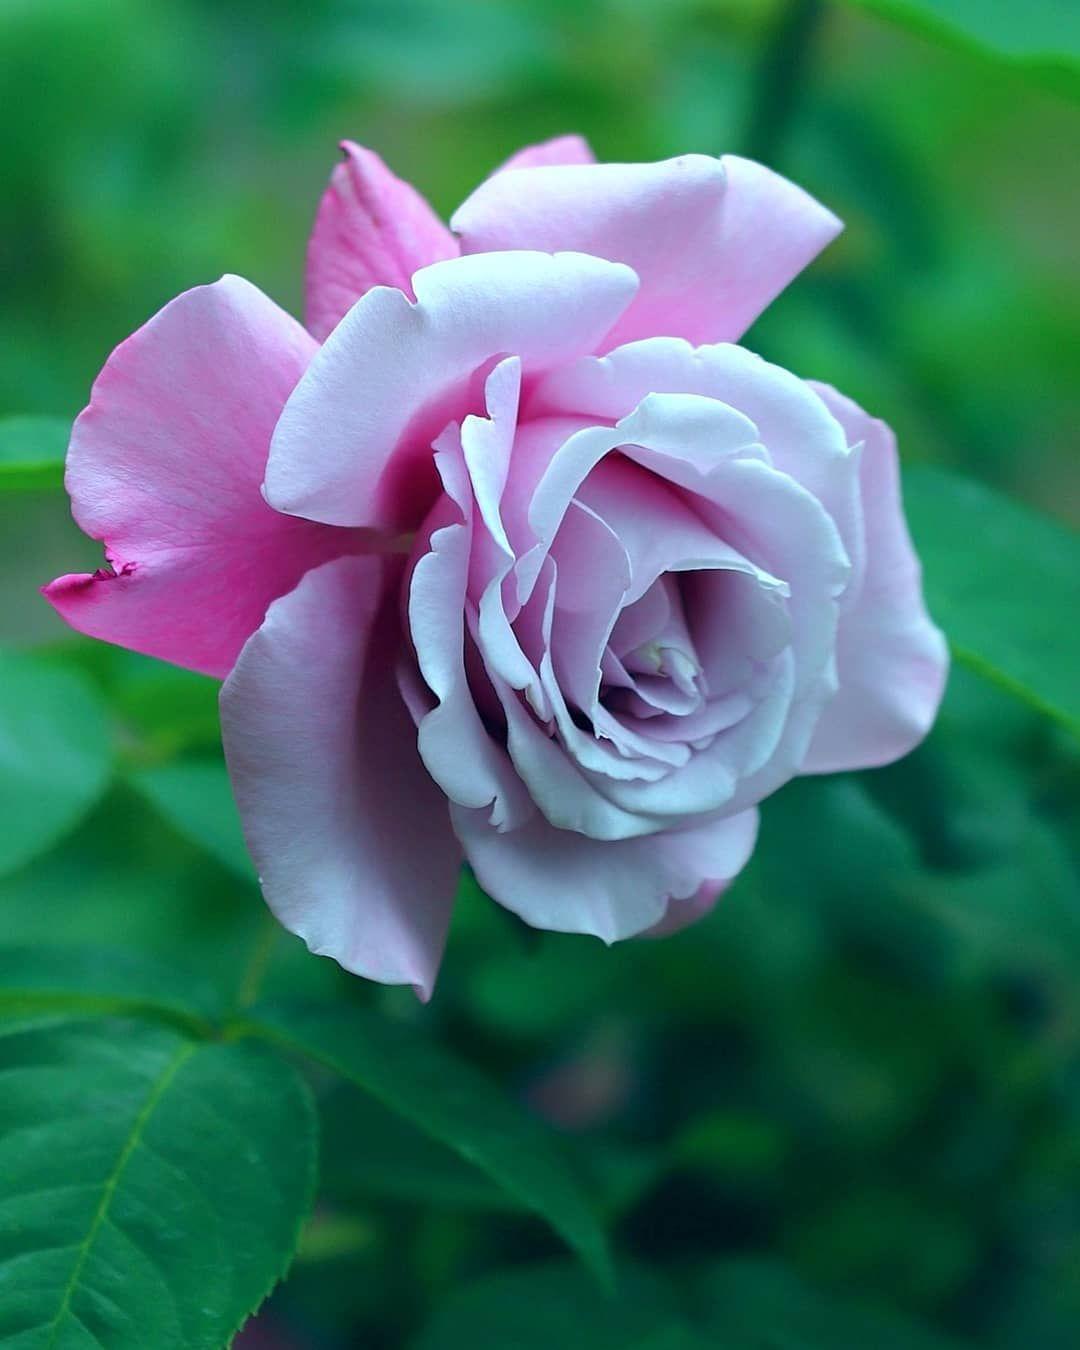 "Polubienia: 173, komentarze: 3 – meiko🦋風花🦋 (@meiko_fuuka) na Instagramie: "". #flowerpassion_world #flowers_collectio  #loves_united_flora #flower_igers #mta_flowers…"""